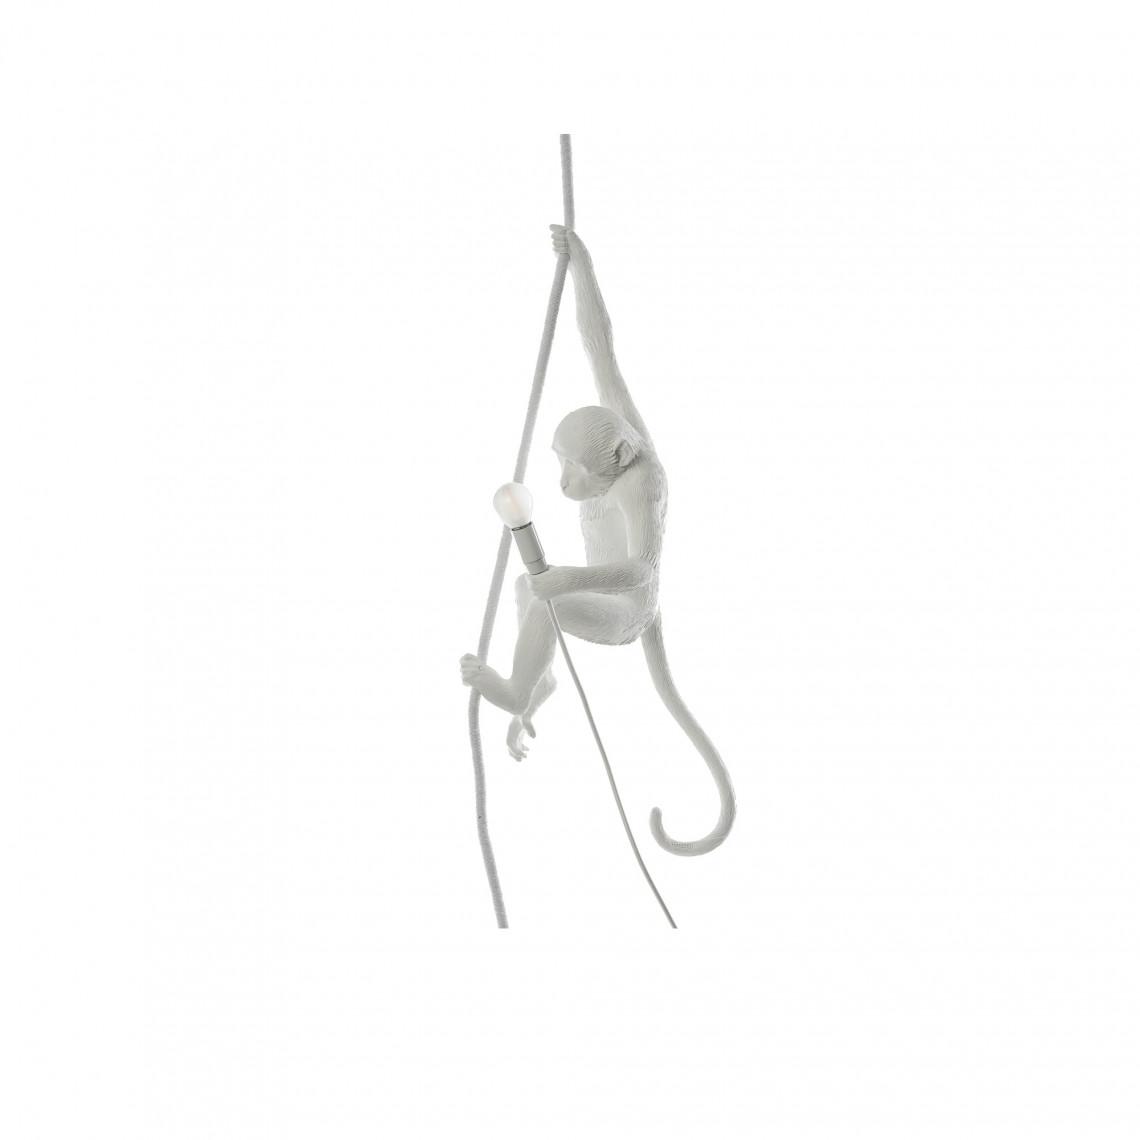 The Monkey Lamp Ceiling - Vit